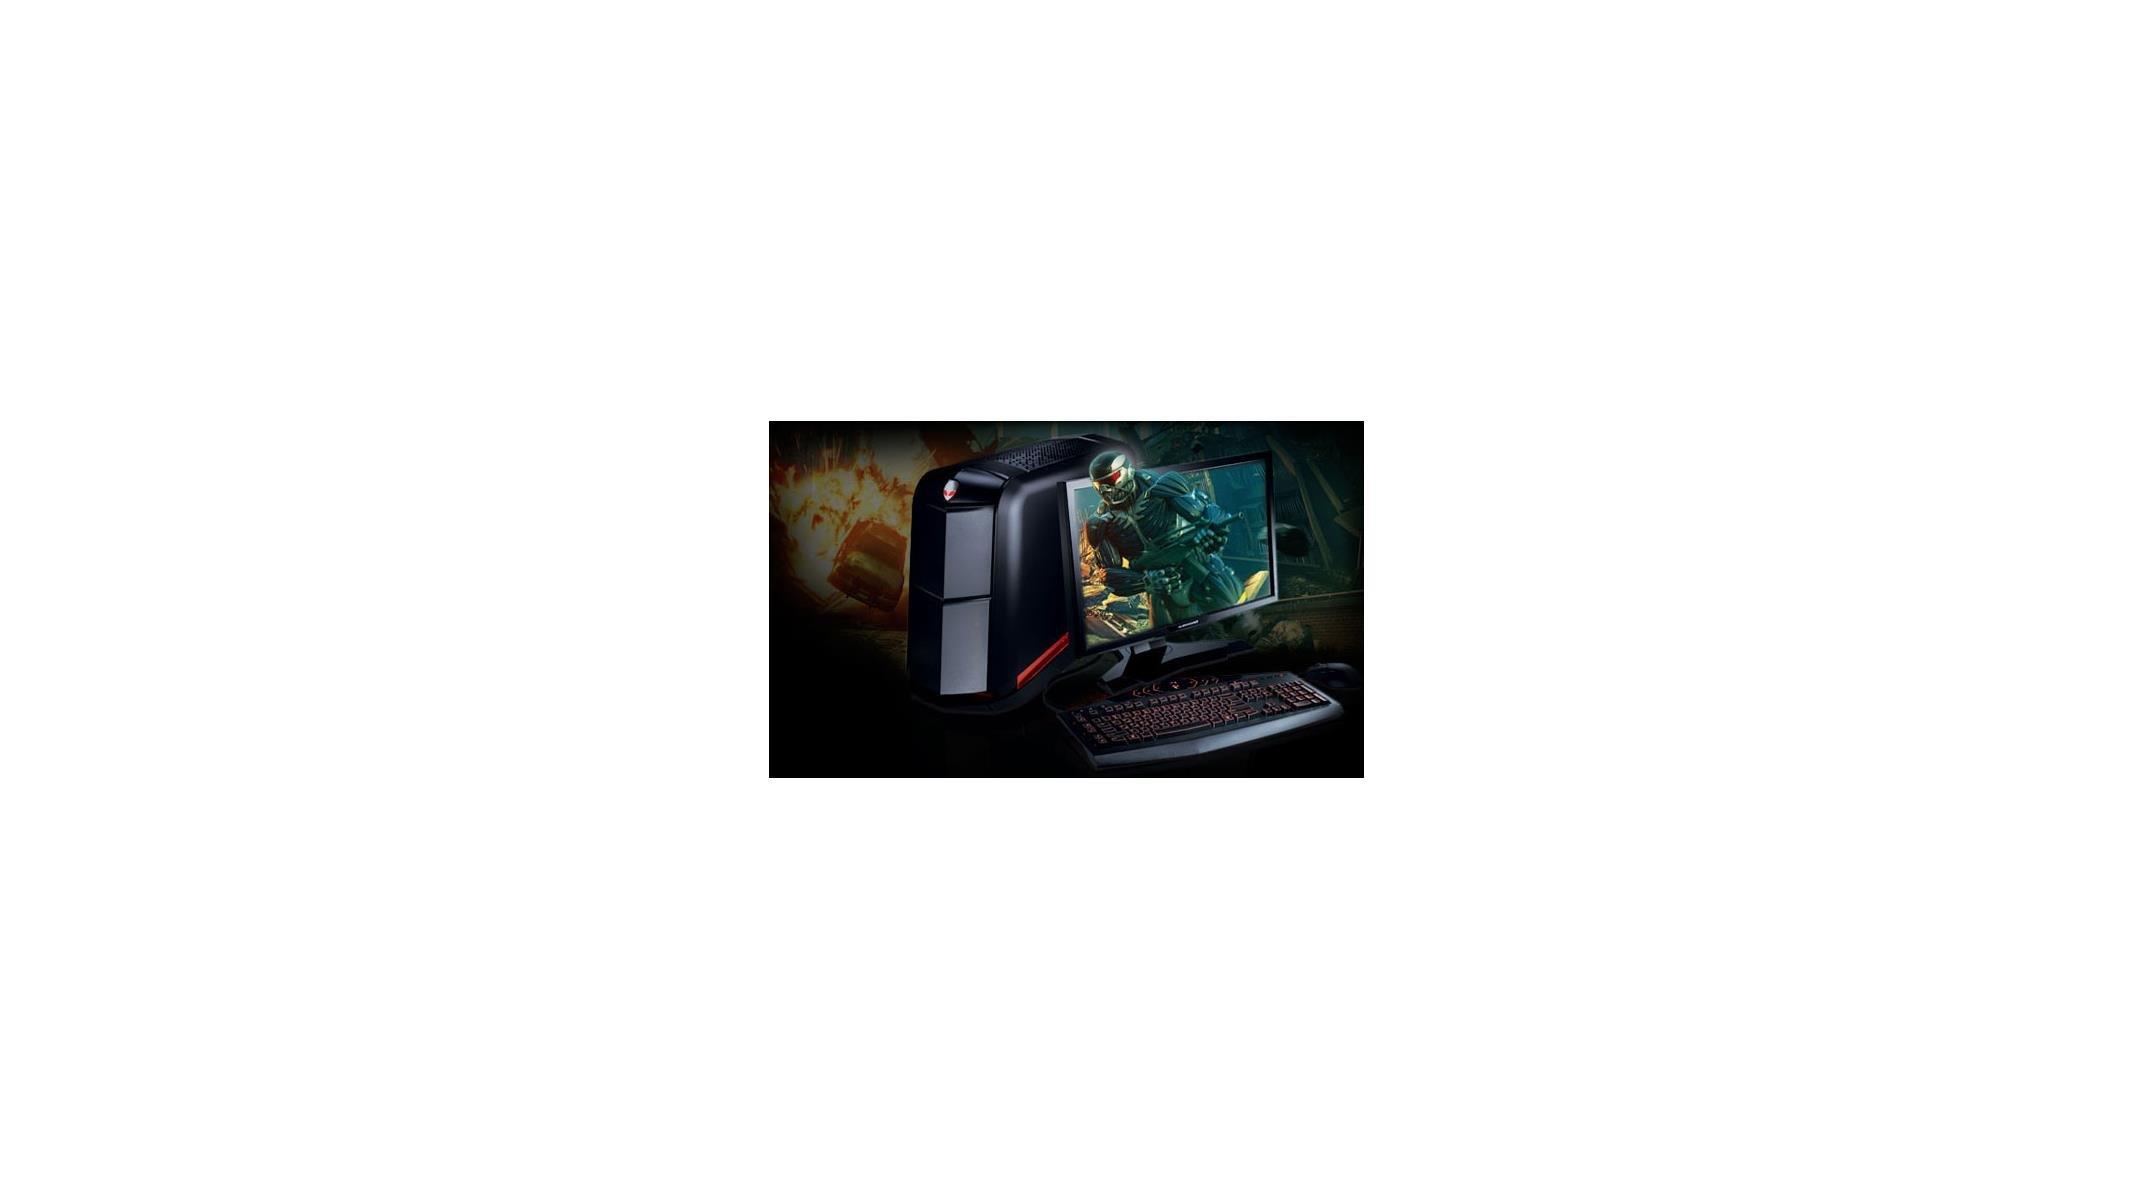 Alienware Aurora R3 System Autopsy - Page 3 | HotHardware